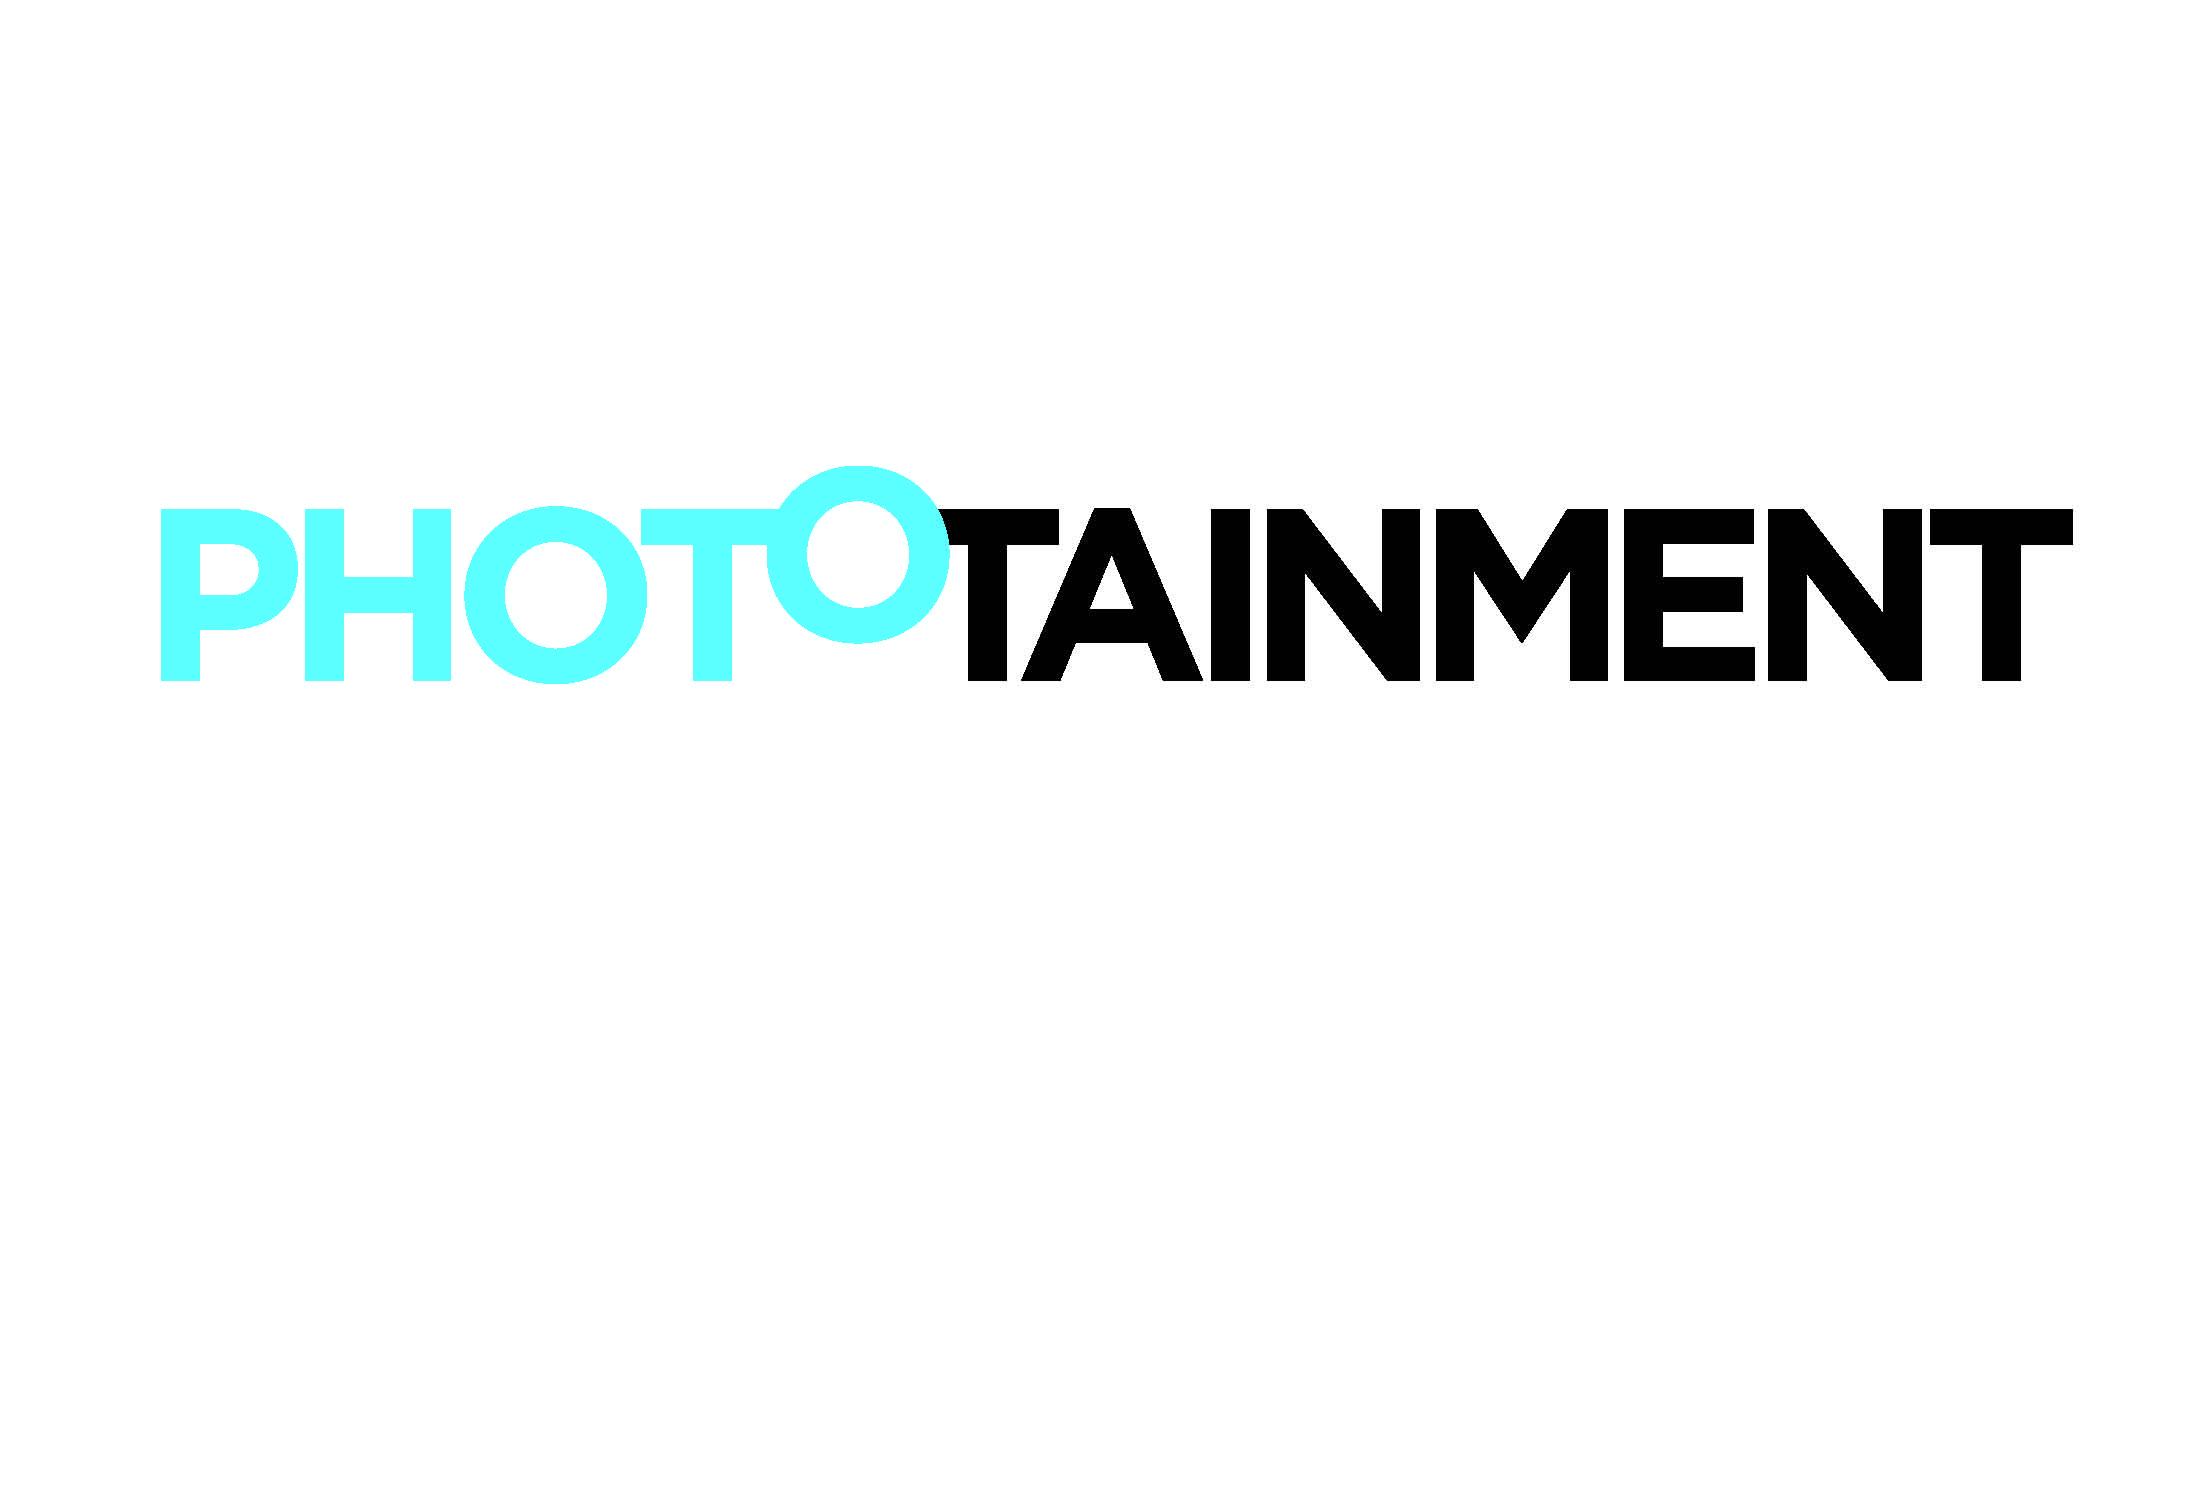 Phototainment